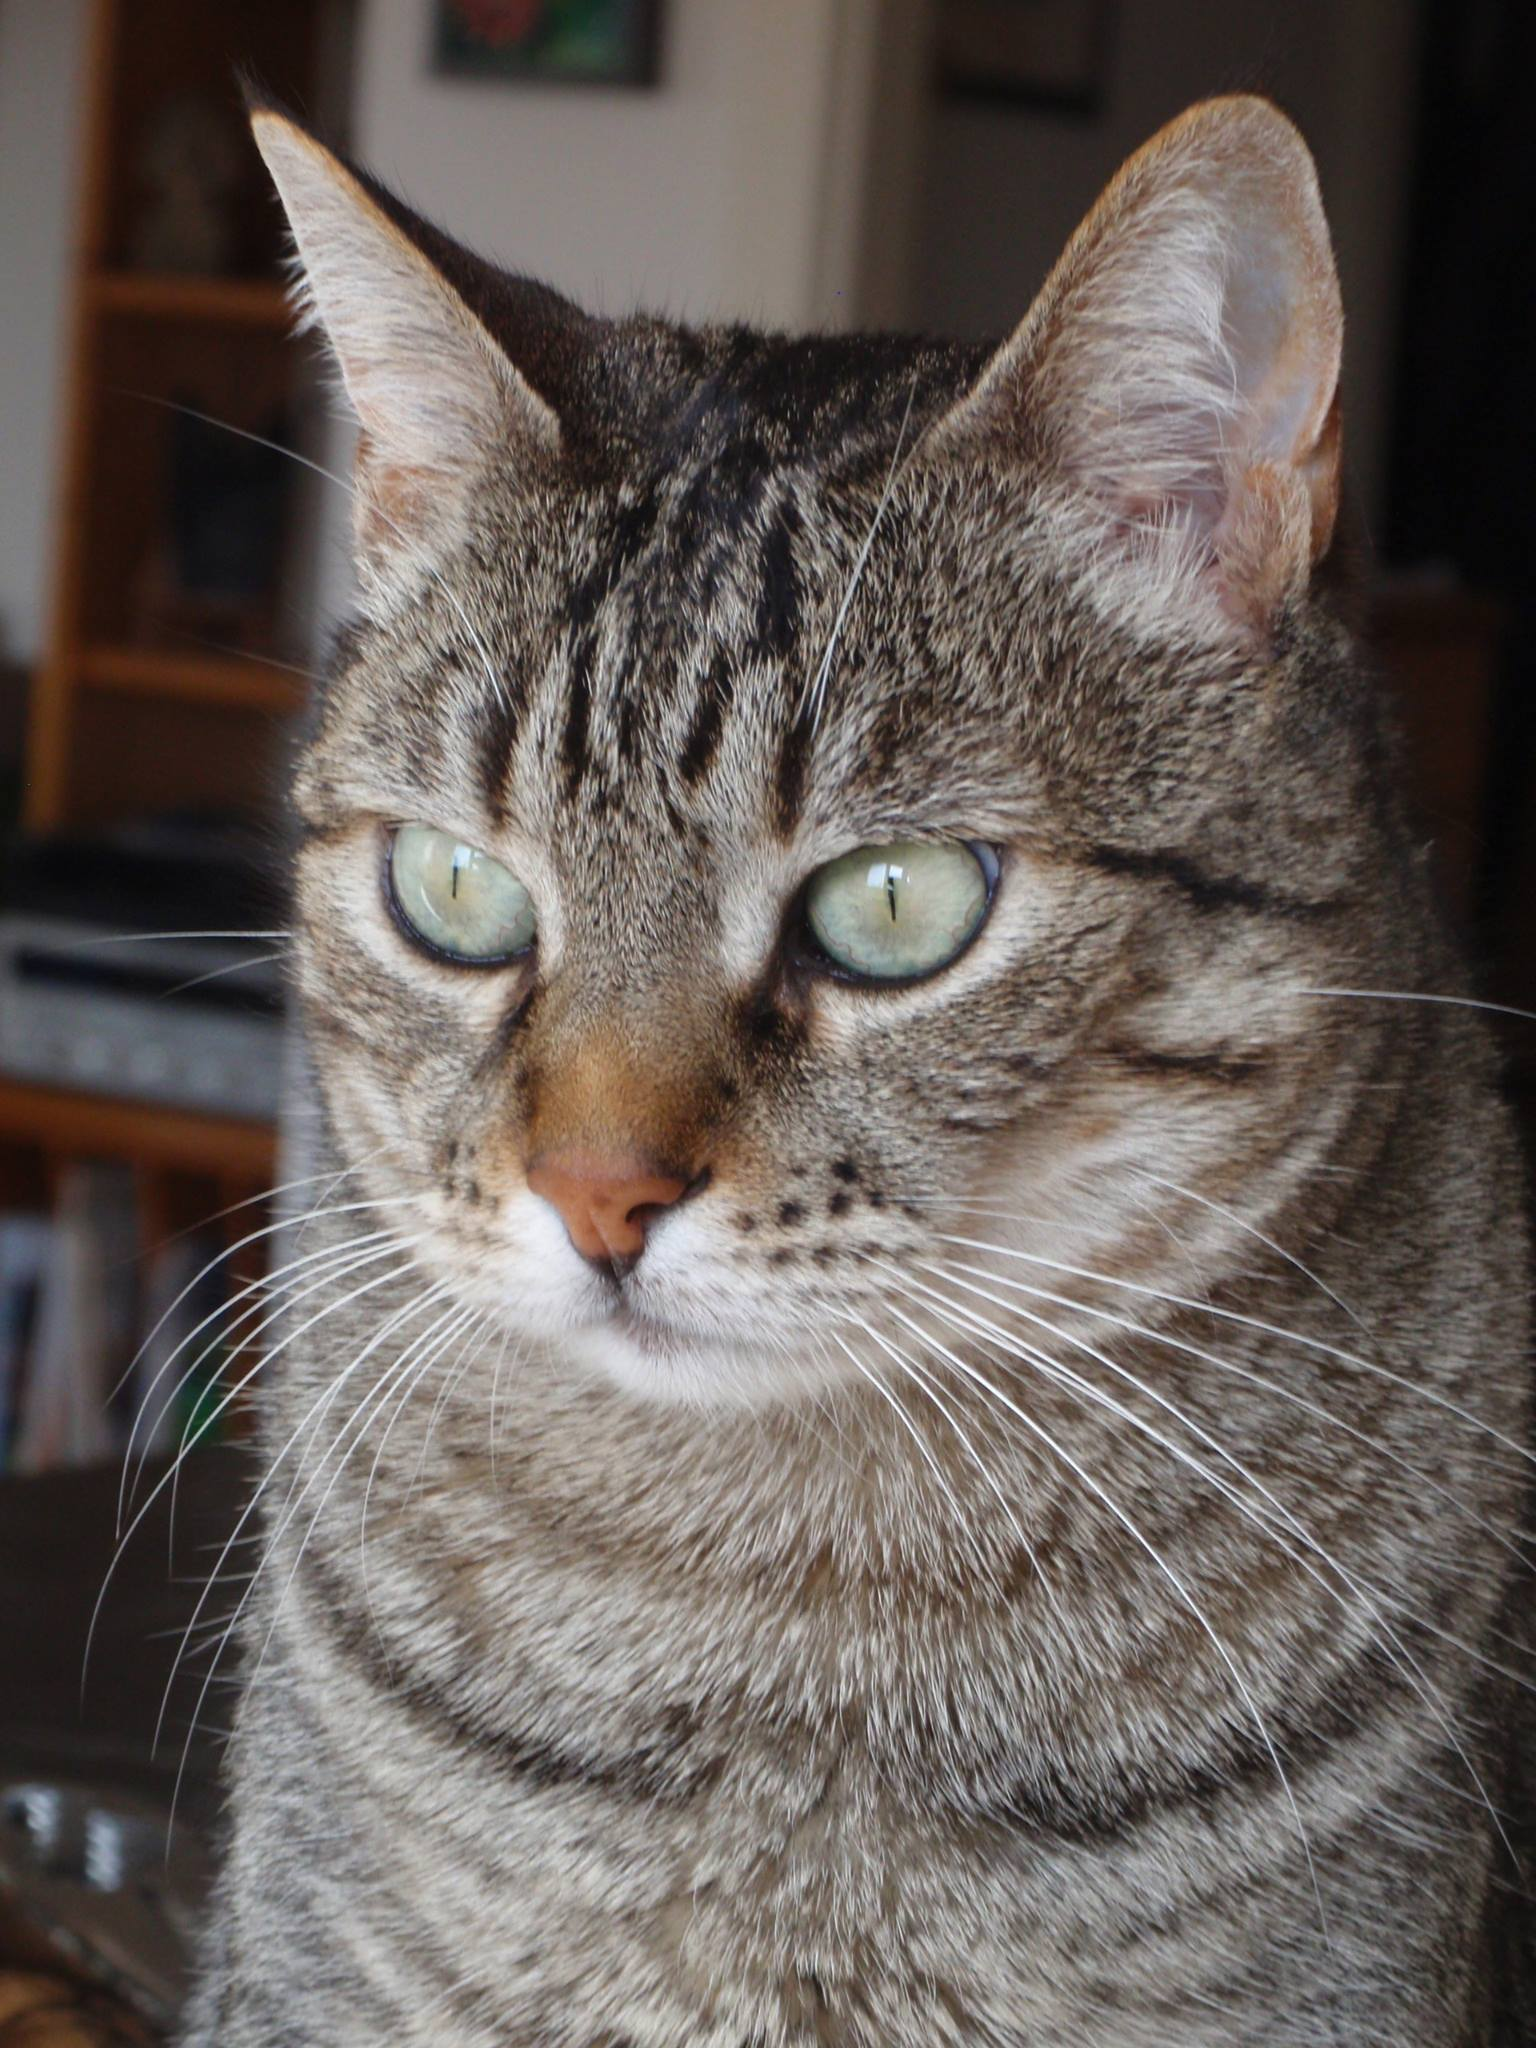 Animal healing - Wisdom in the eyes of kitty